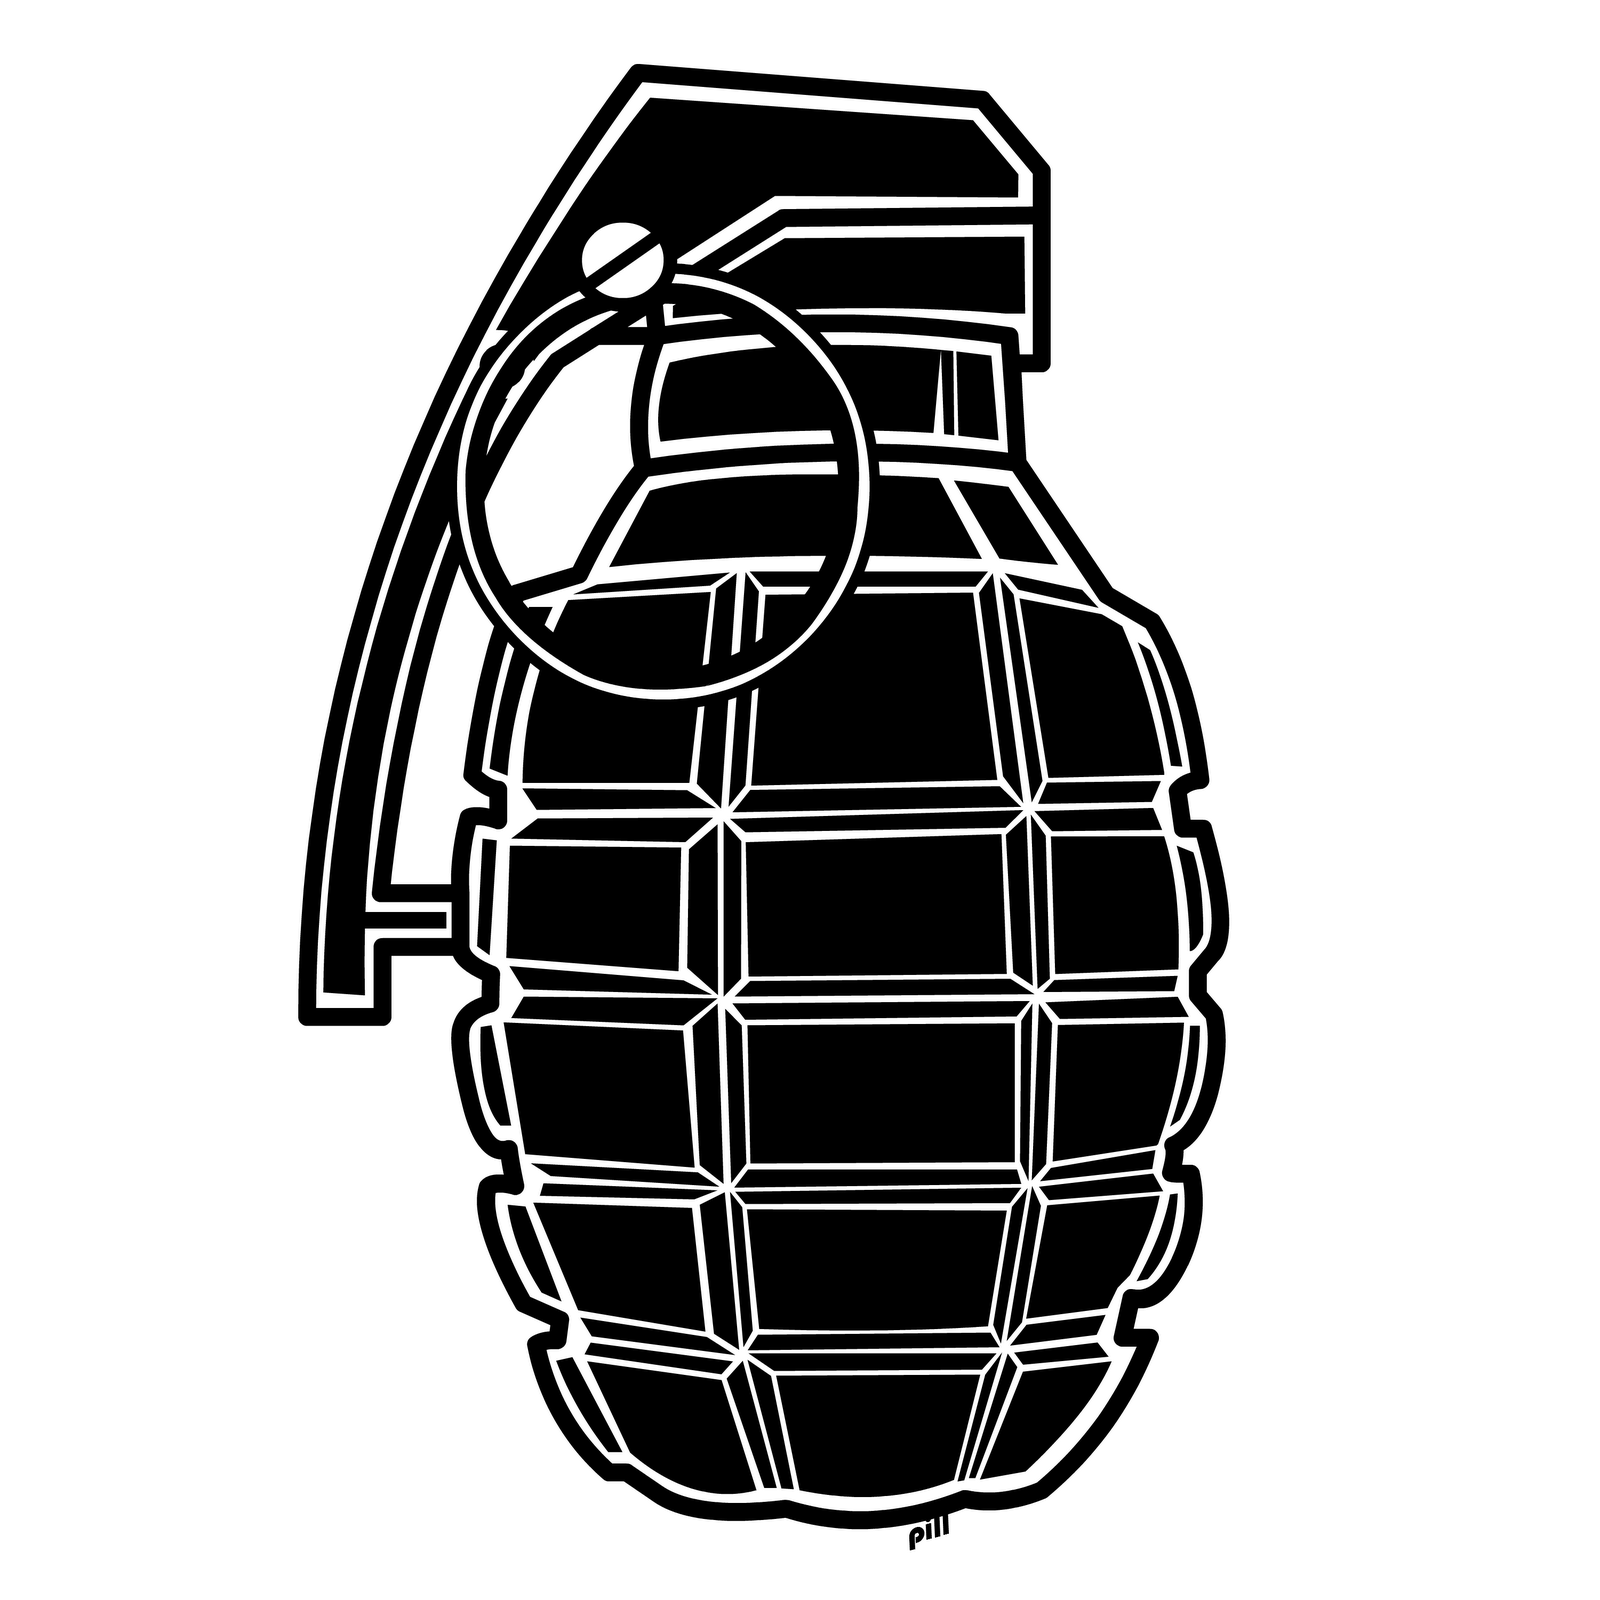 Grenade PNG images.